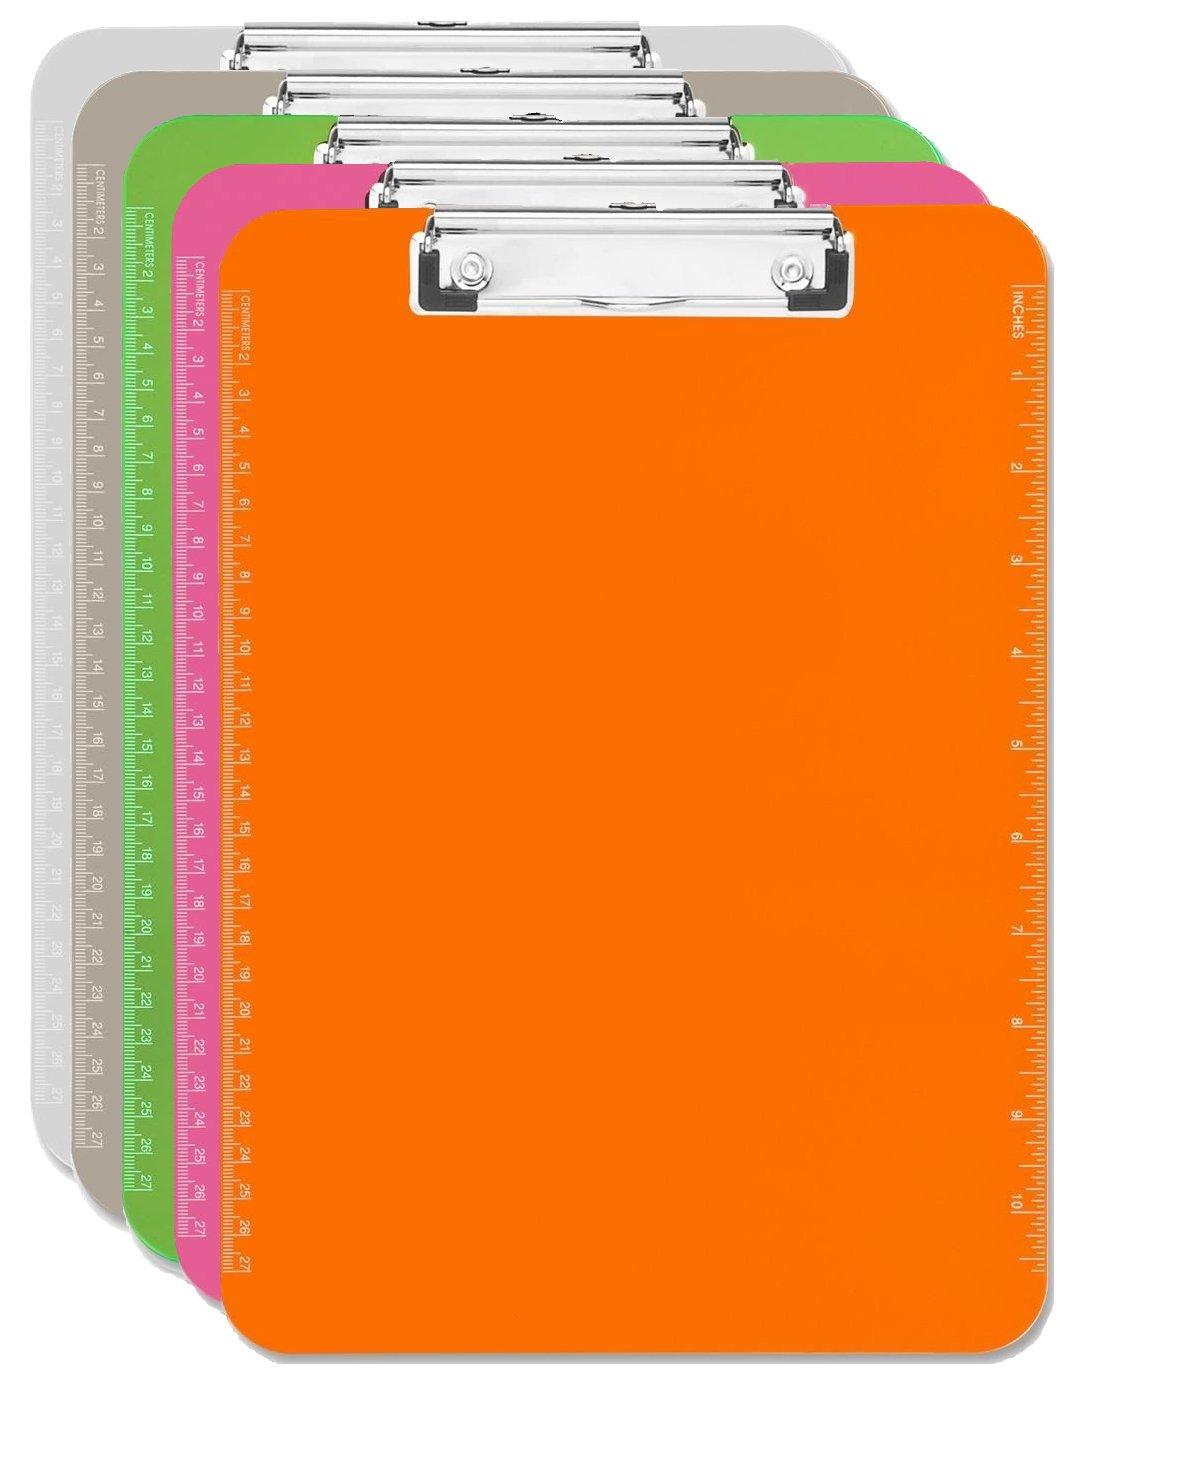 Clipboard Clear Smoke Orange Green Image 1